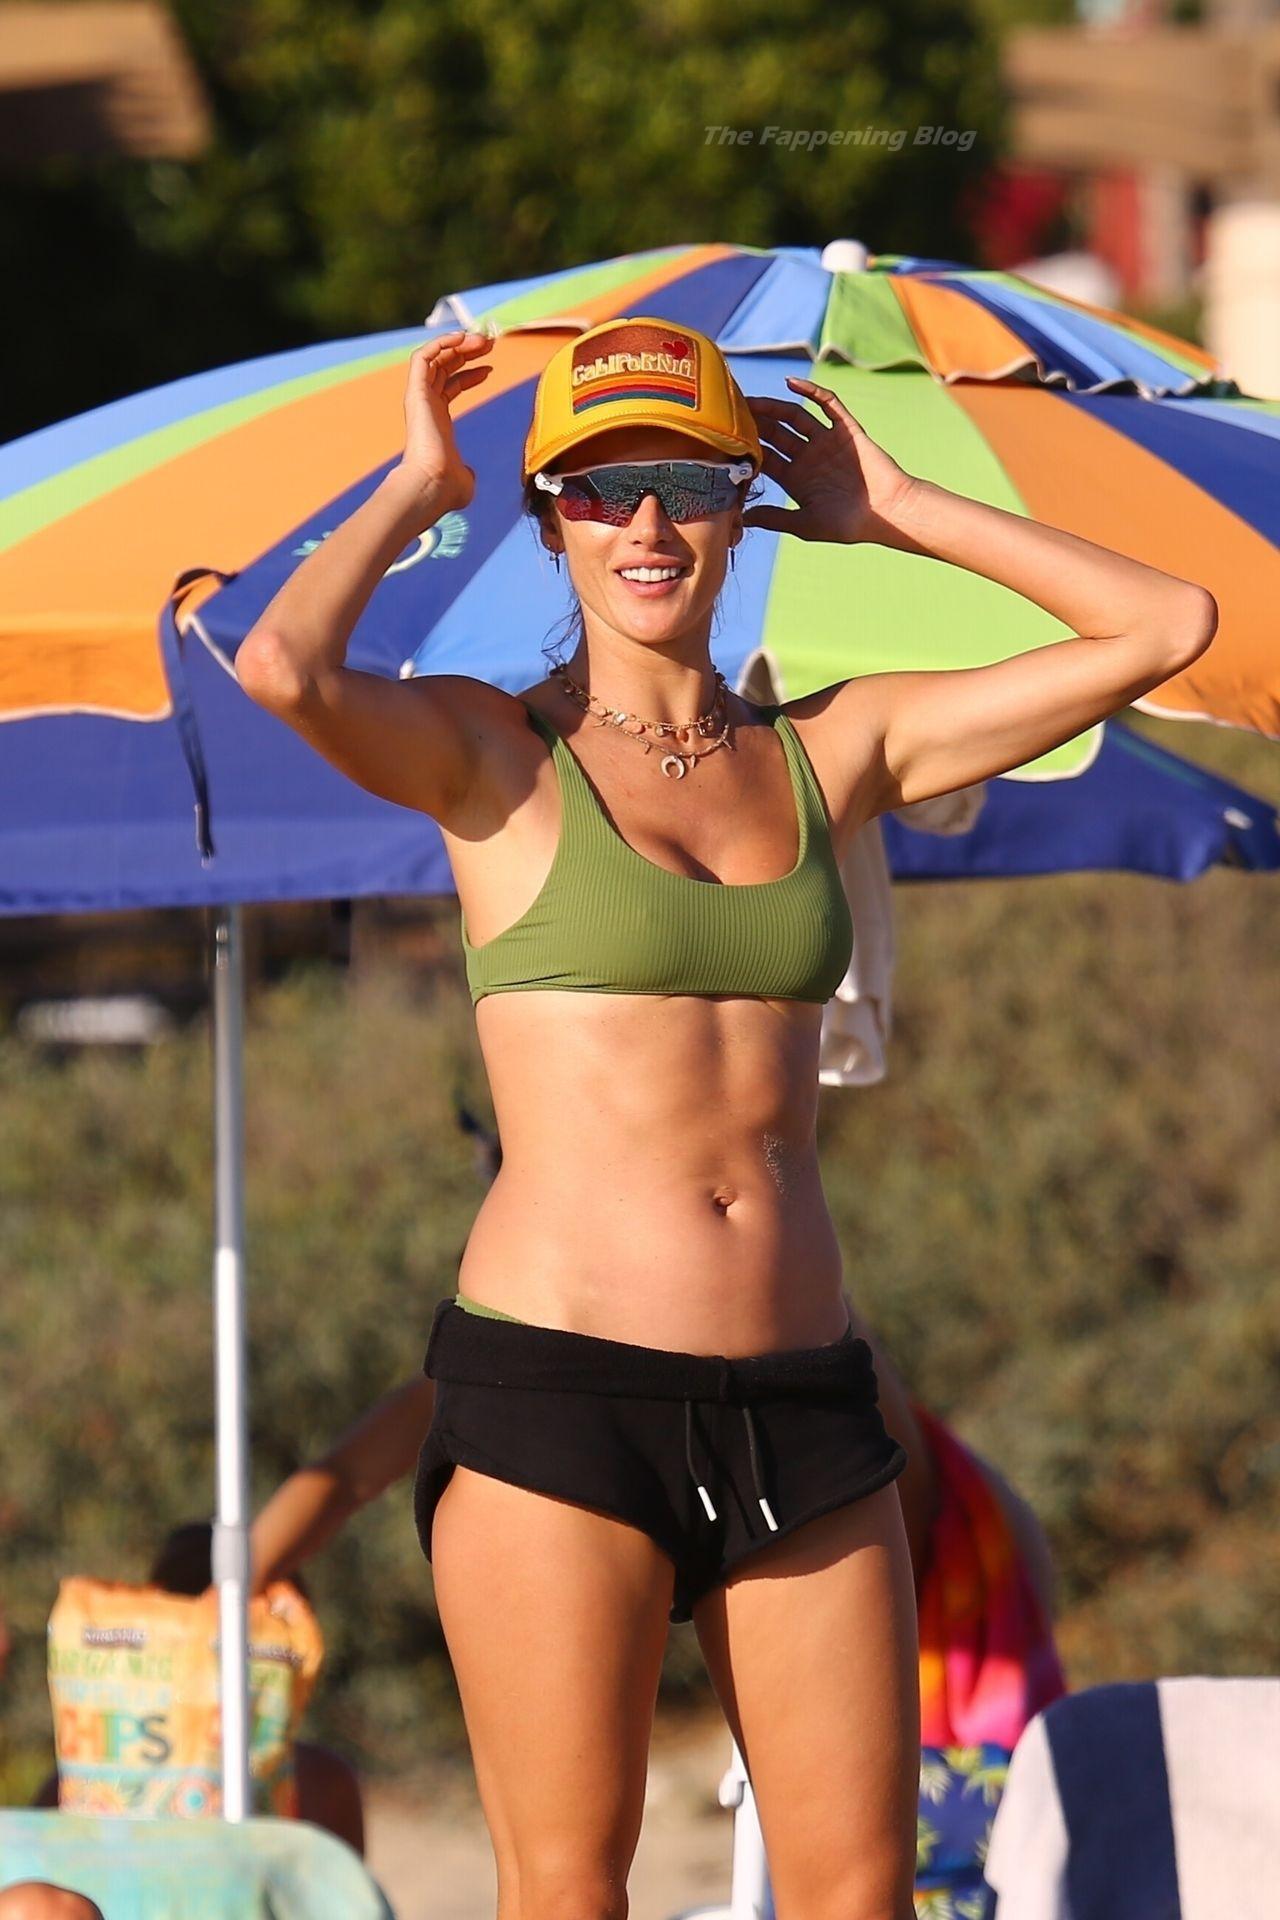 Alessandra Ambrosio Sexy on Beach 95